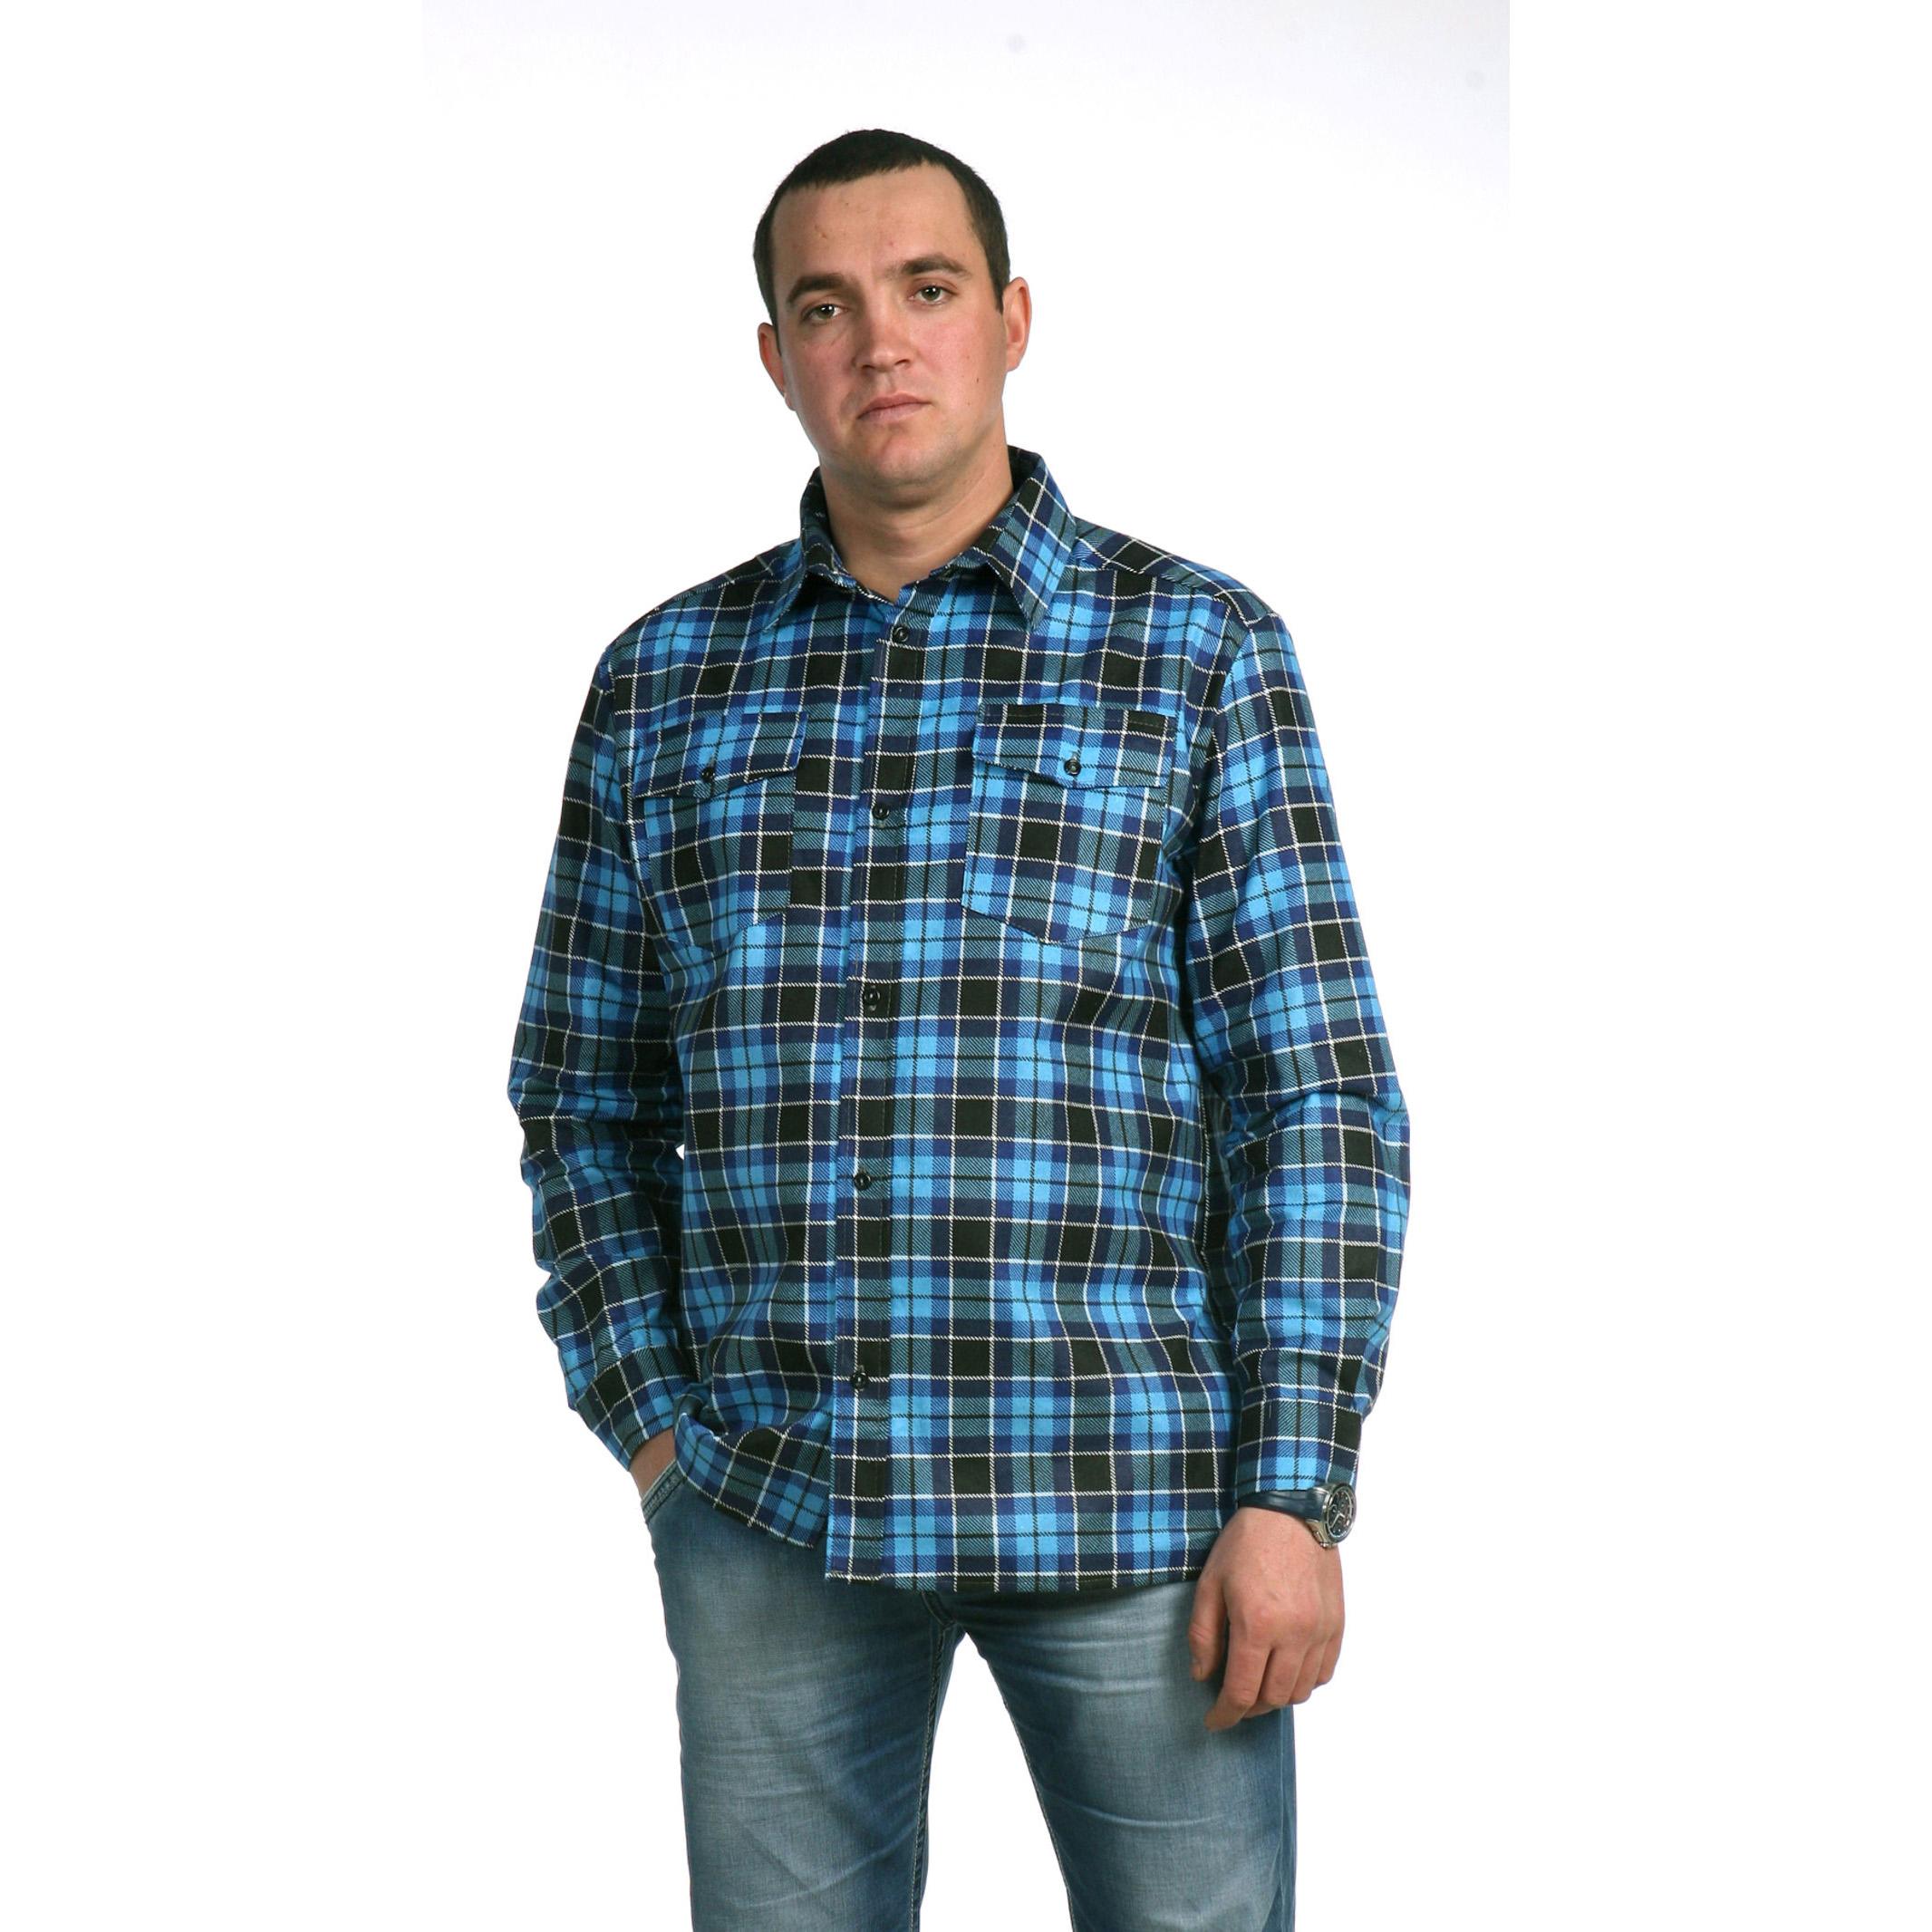 Мужская рубашка «Гарри», размер 48Толстовки, джемпера и рубашки<br>Обхват груди:96 см<br>Обхват талии:88 см<br>Обхват бедер:102 см<br>Обхват шеи, ворот:40 см<br>Рост:172-180 см<br><br>Тип: Муж. рубашка<br>Размер: 48<br>Материал: Фланель